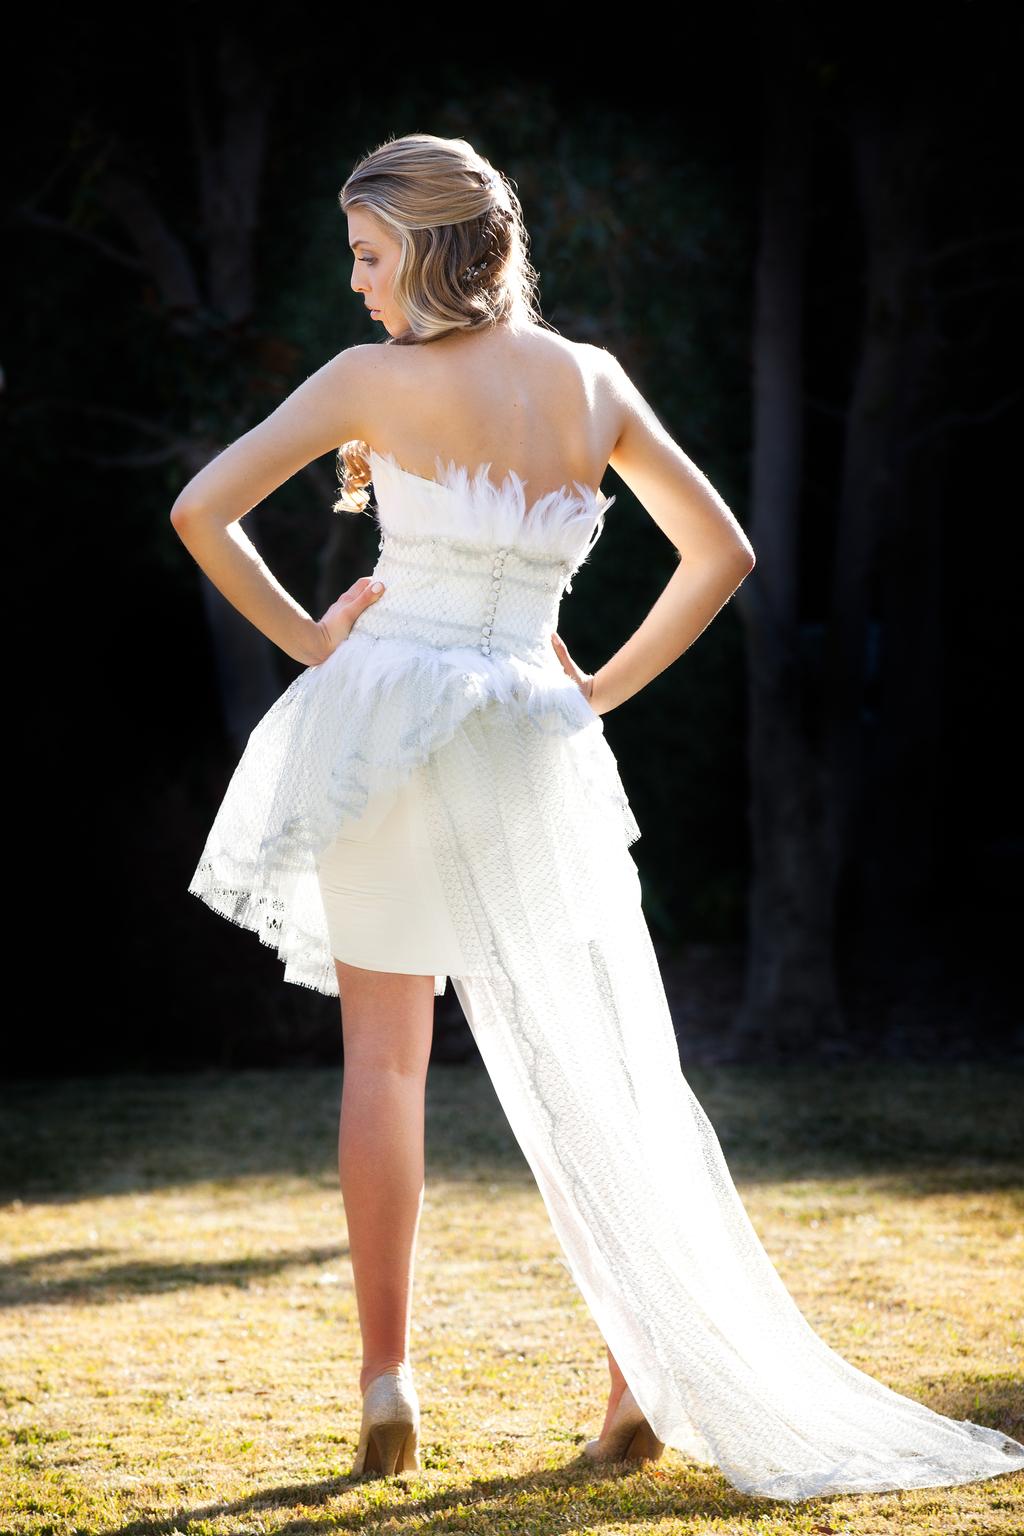 Cocoe-voci-wedding-dress-spring-2012-zoe-back.full